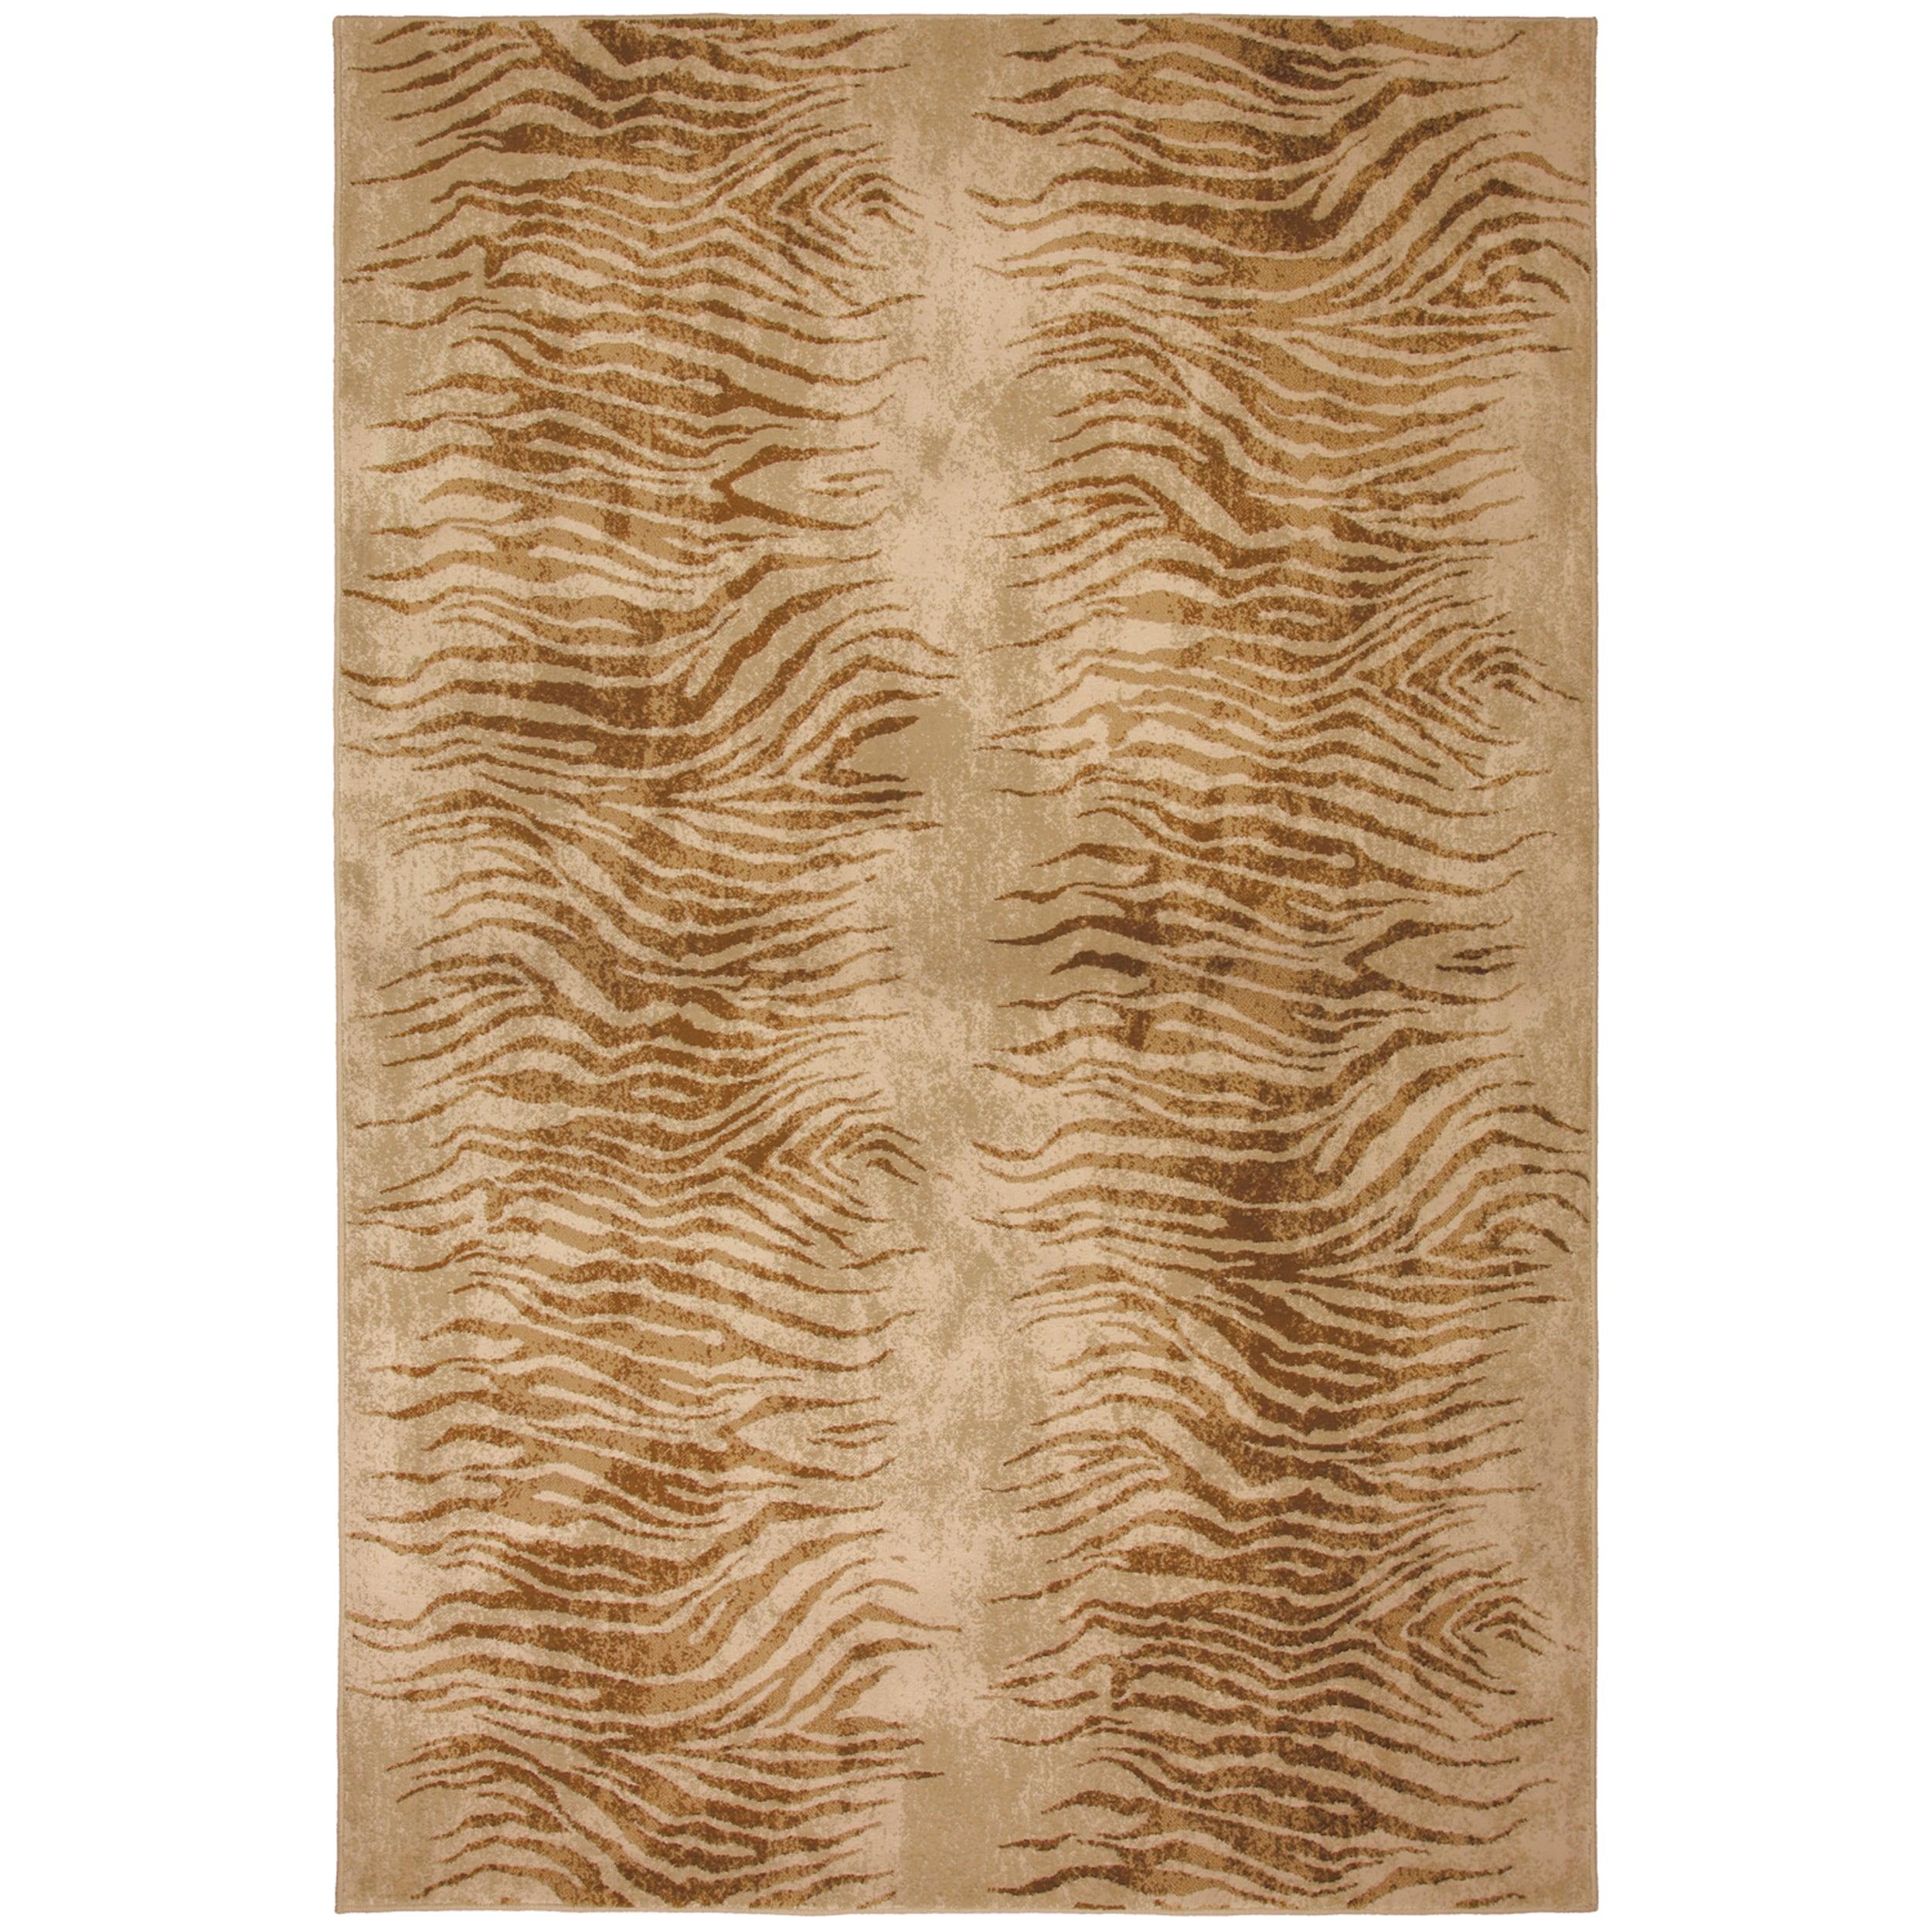 Serengeti Rug (5'3 x 7'10)